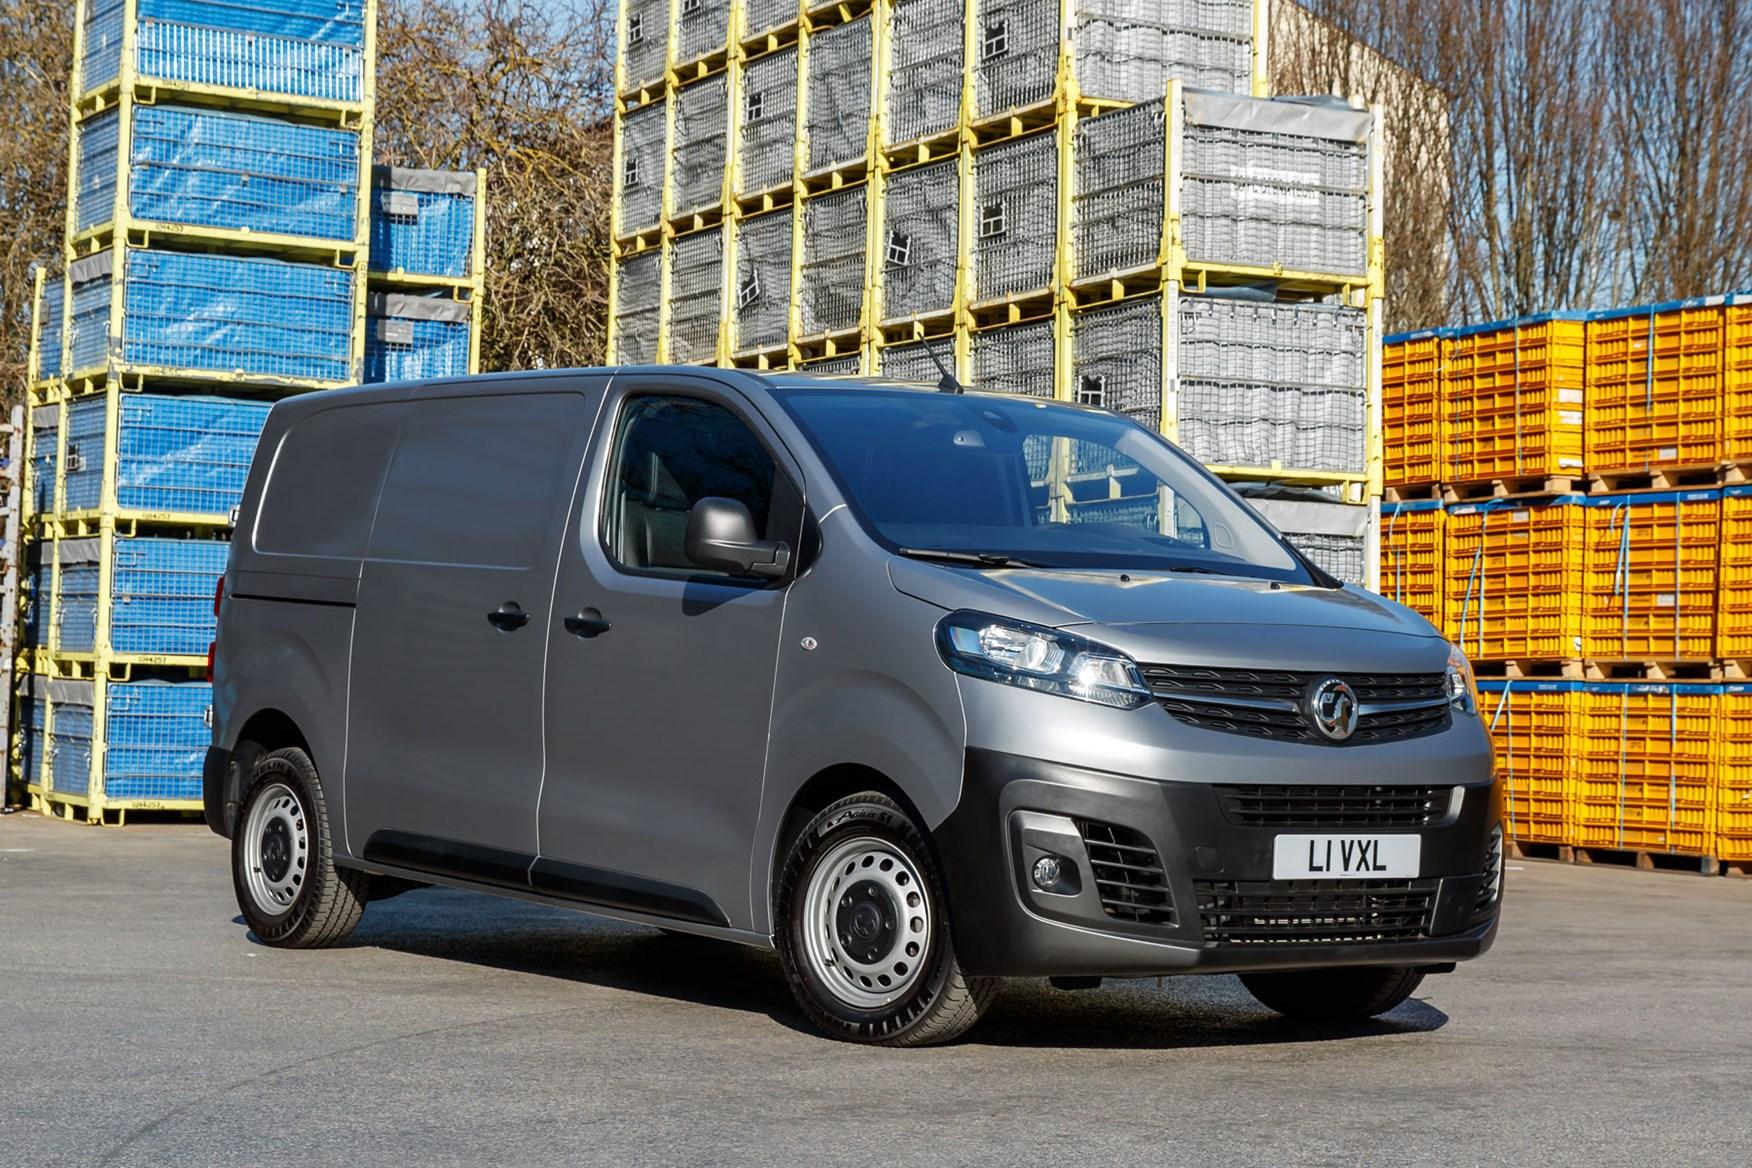 Vauxhall Vivaro review - front view, silver, builders merchants